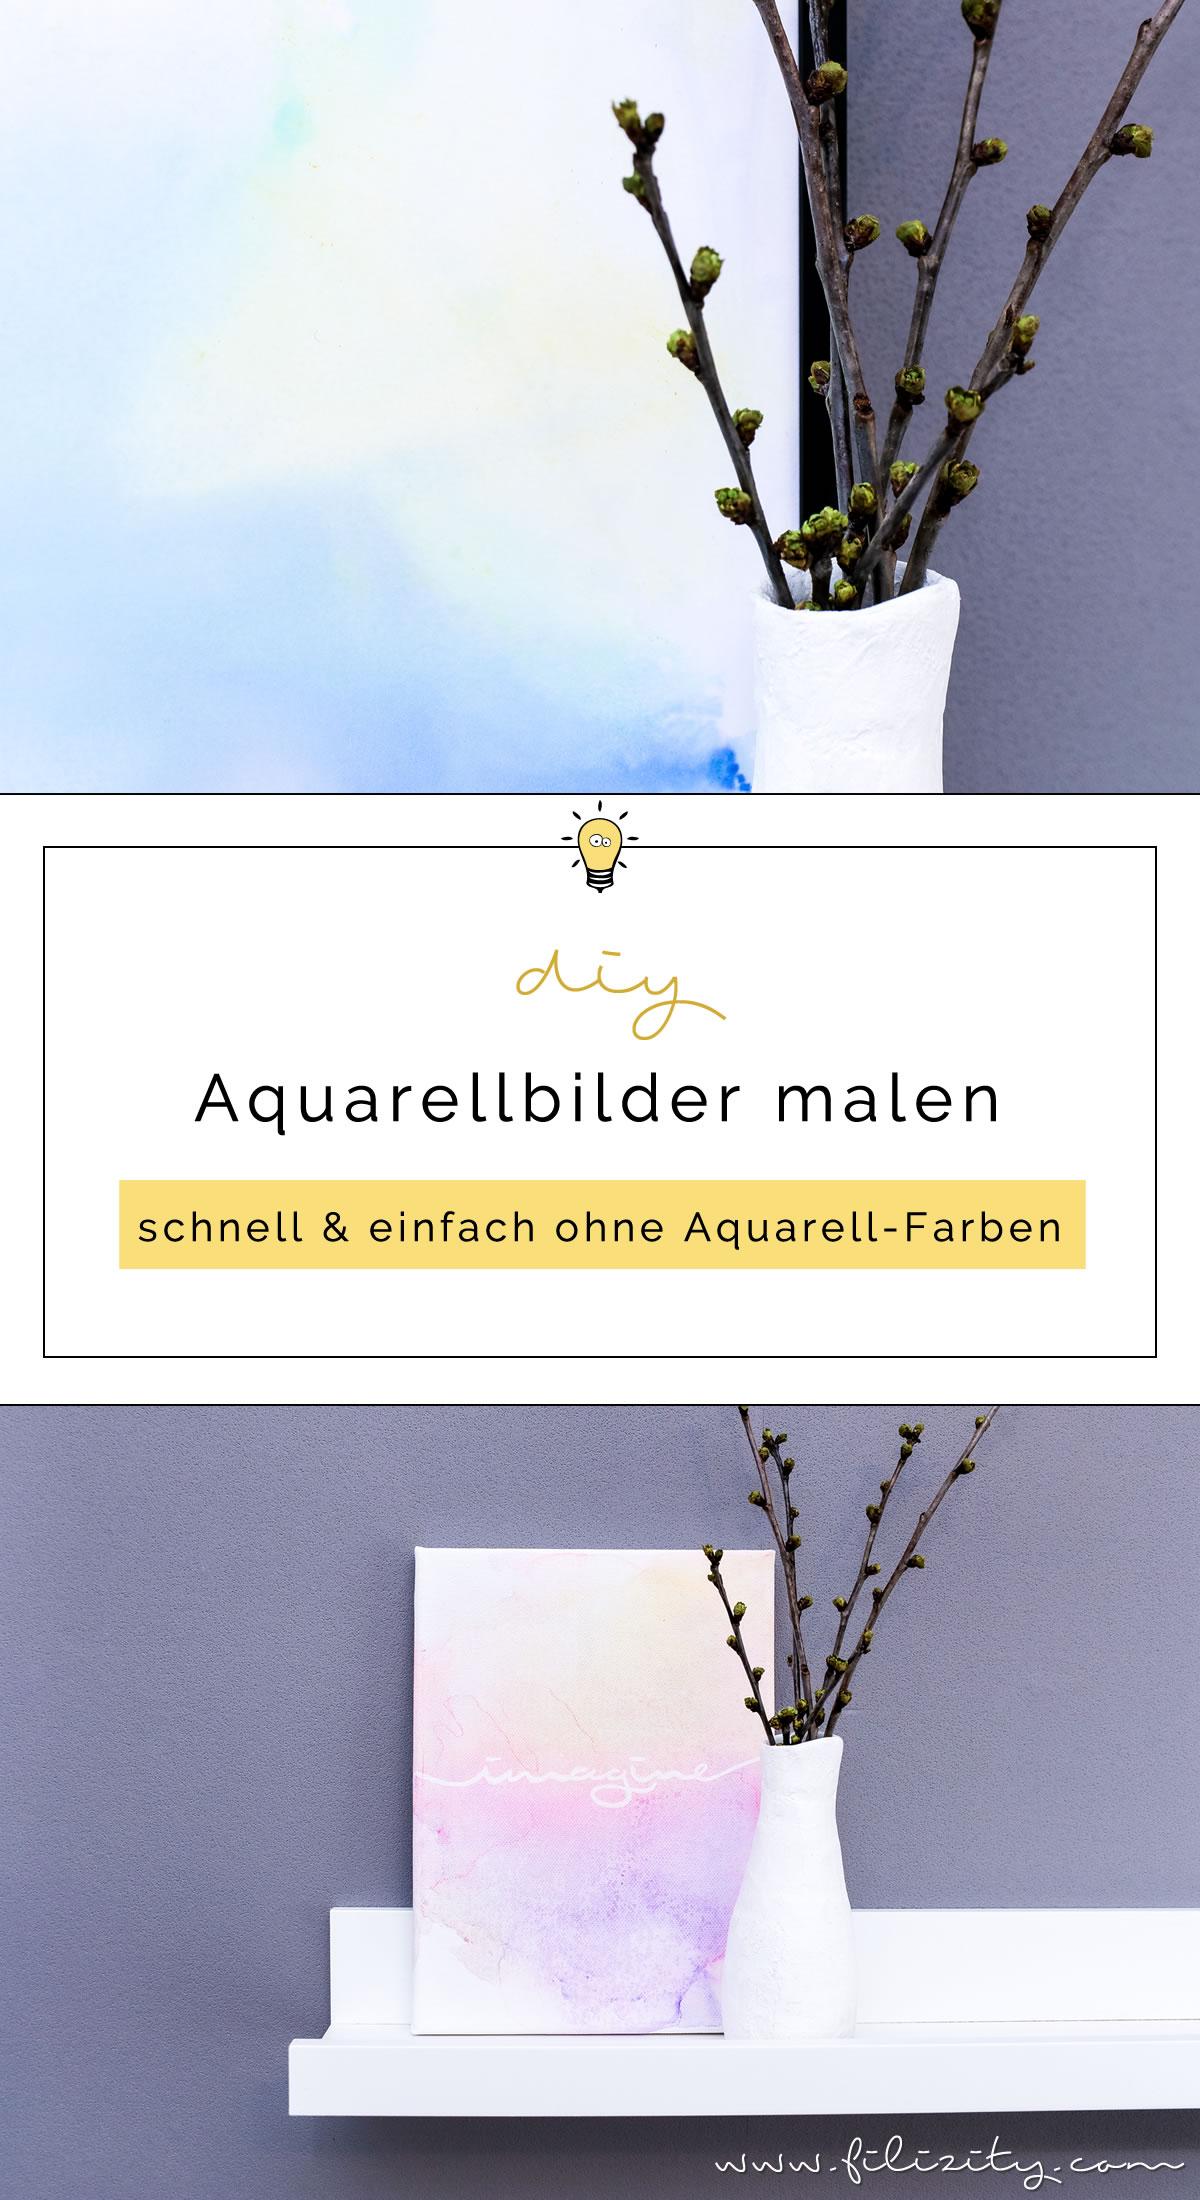 Abstrakte Aquarell-Bilder malen - Schnell & einfach ohne Aquarellfarben | DIY Deko mit Aquarell | Filizity.com | Interior- & DIY-Blog aus dem Rheinland #aquarell #malen #handlettering